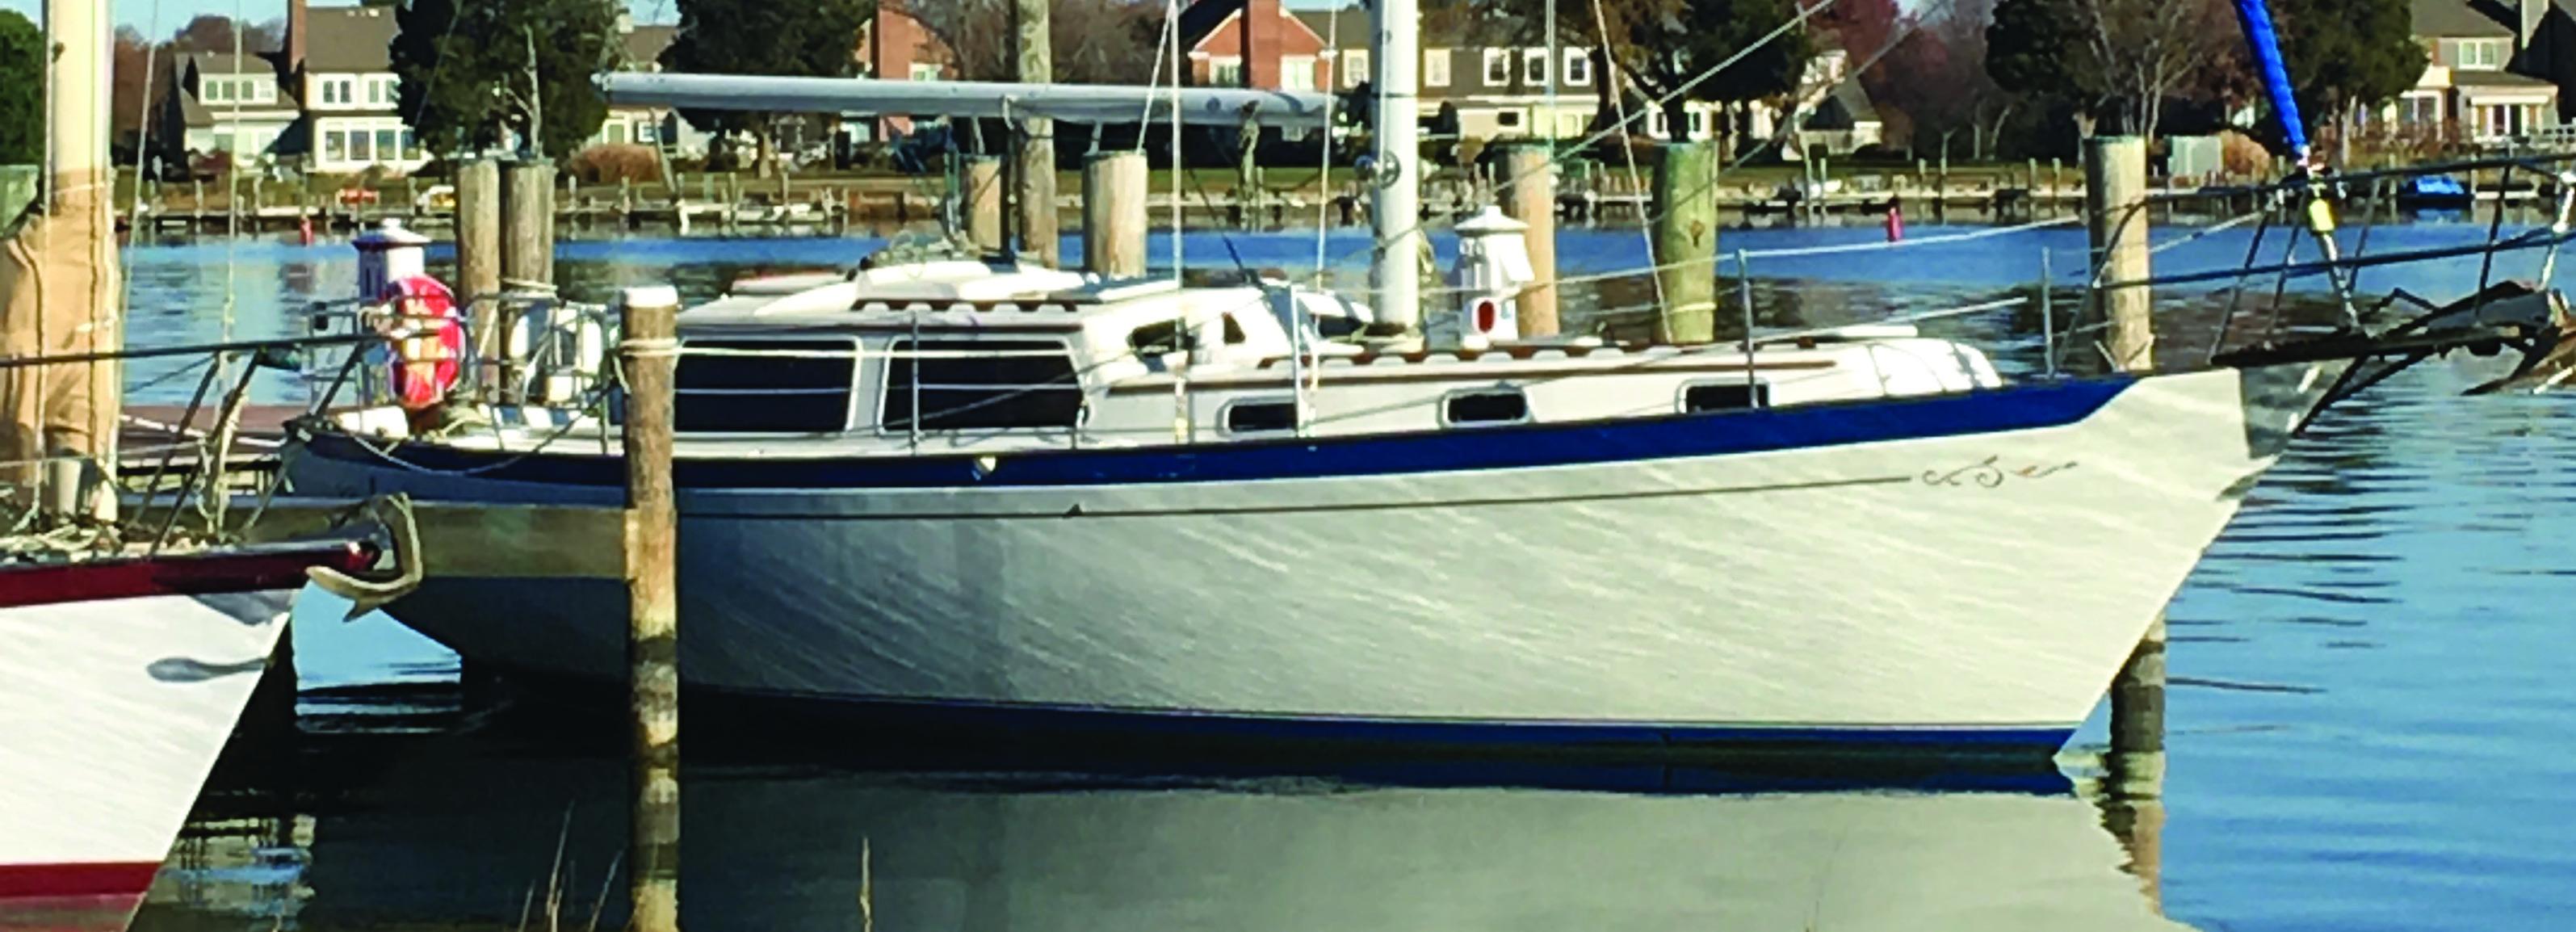 Charity Boat Donation Program